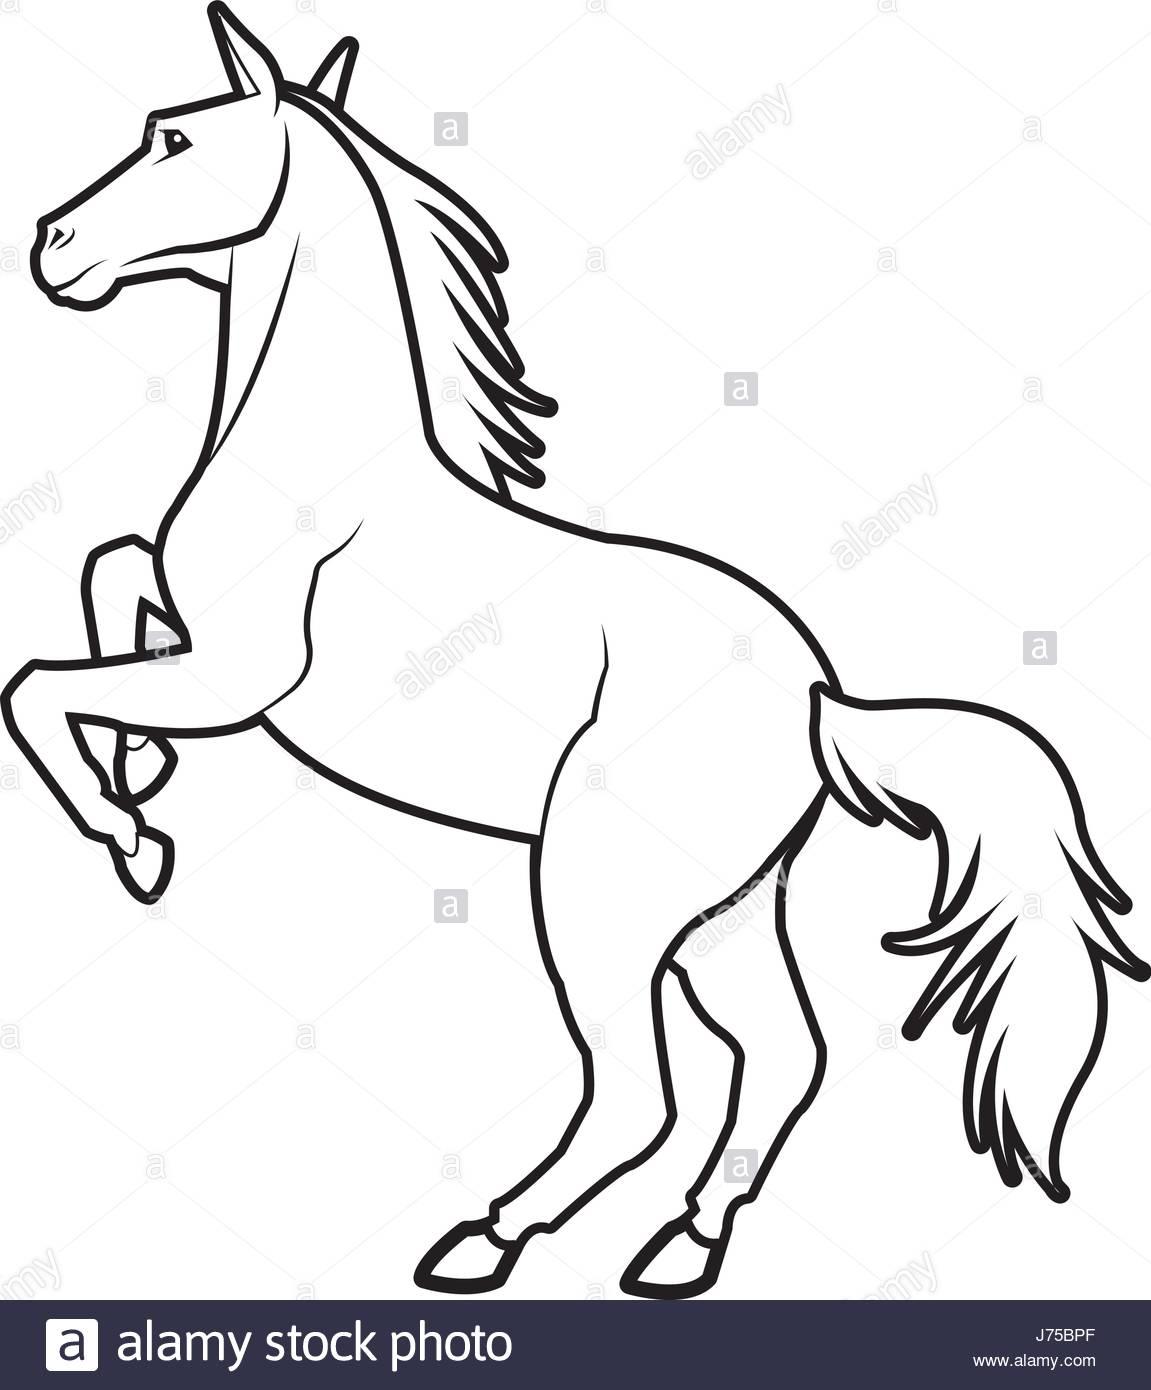 1151x1390 Horse On Two Legs Equine Animal Line Stock Vector Art